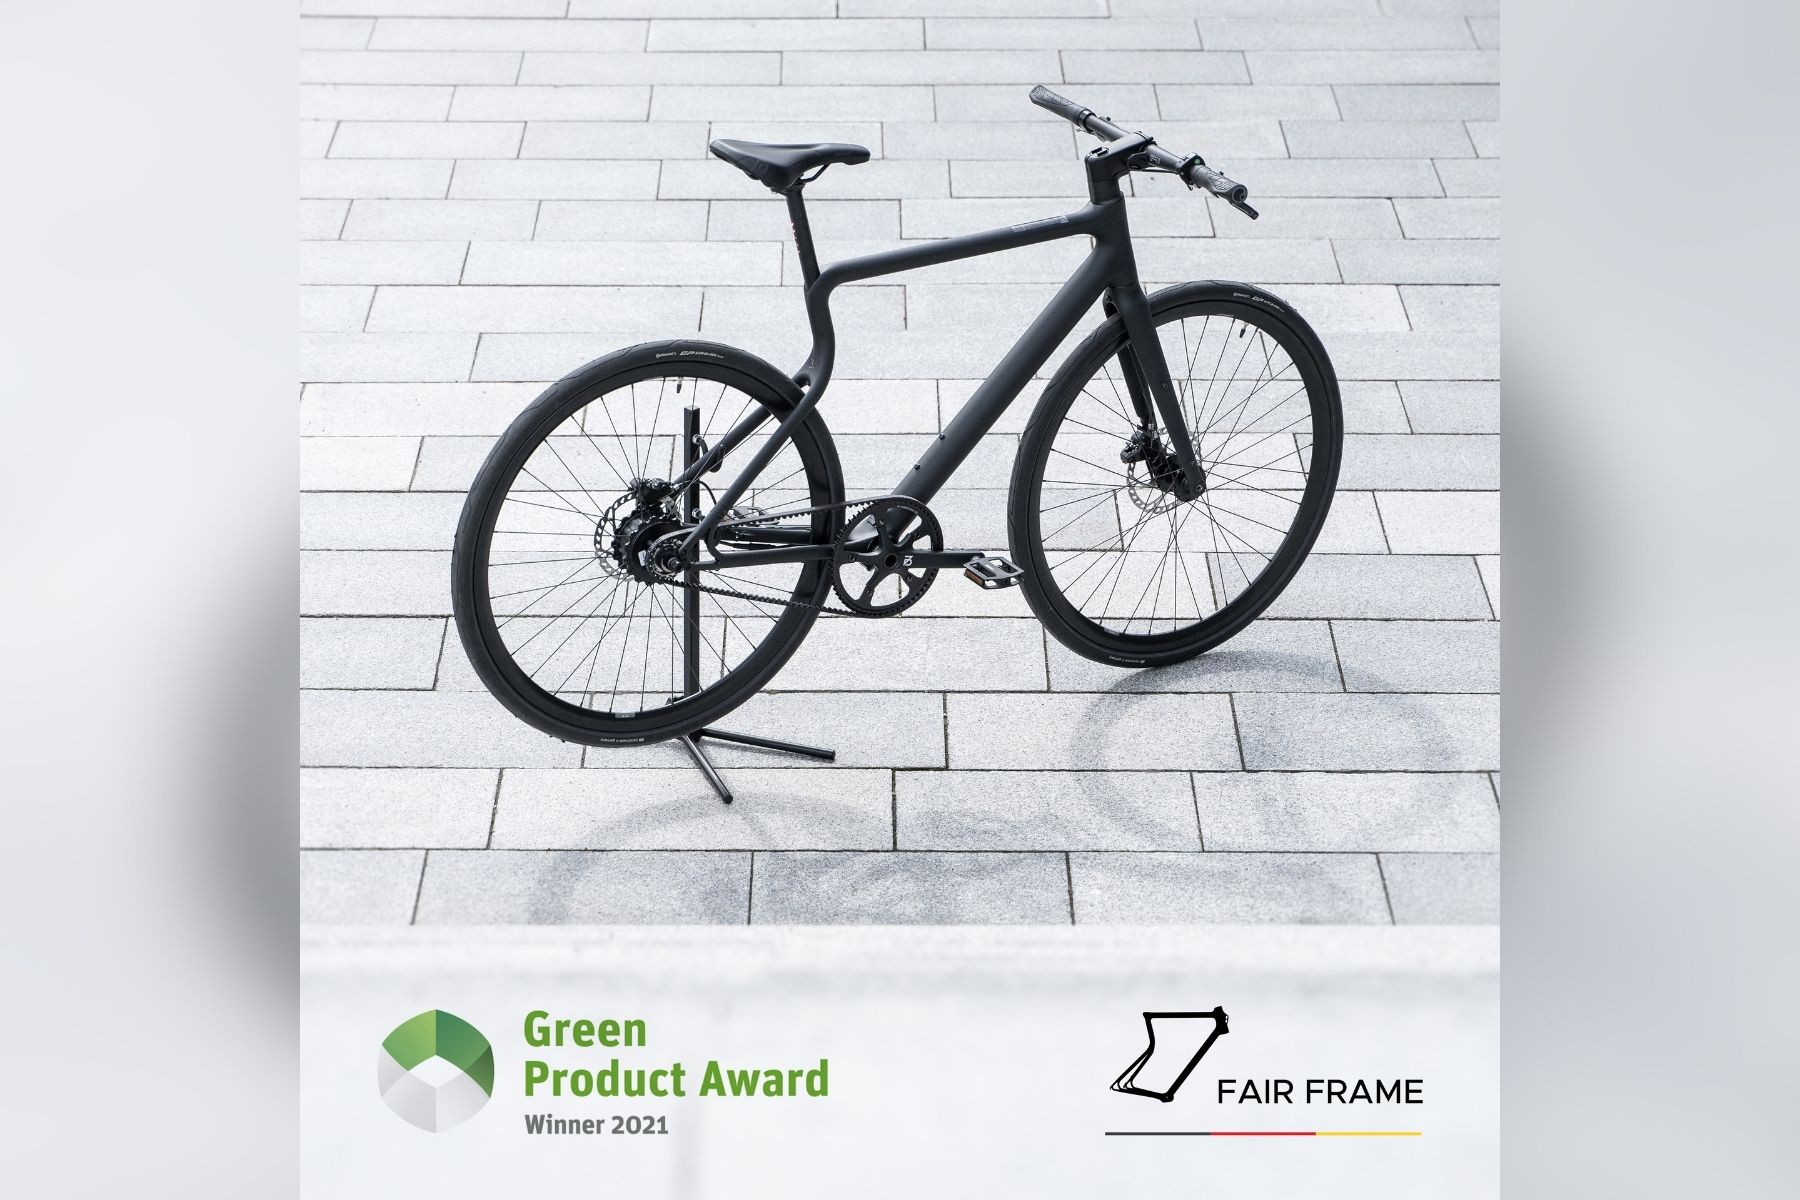 Das grüne E-Bike: URWAHN Platzhirsch gewinnt Green Product Award 2021